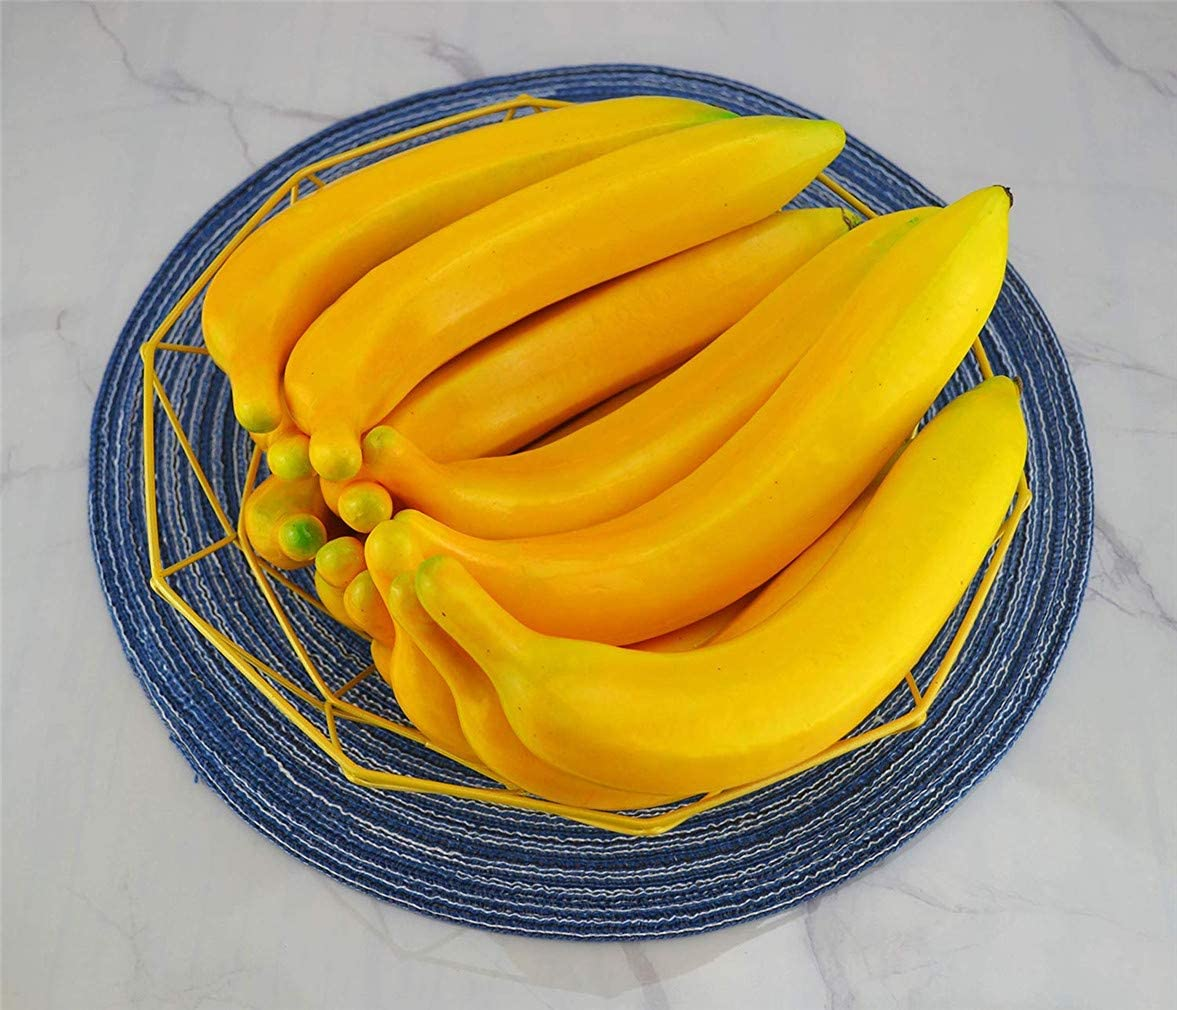 Ulalaza 60Pcs Fake Large Long Green Raisins Artificial Fruits Model Lifelike Home House Kitchen Party Decoration Desk Ornament